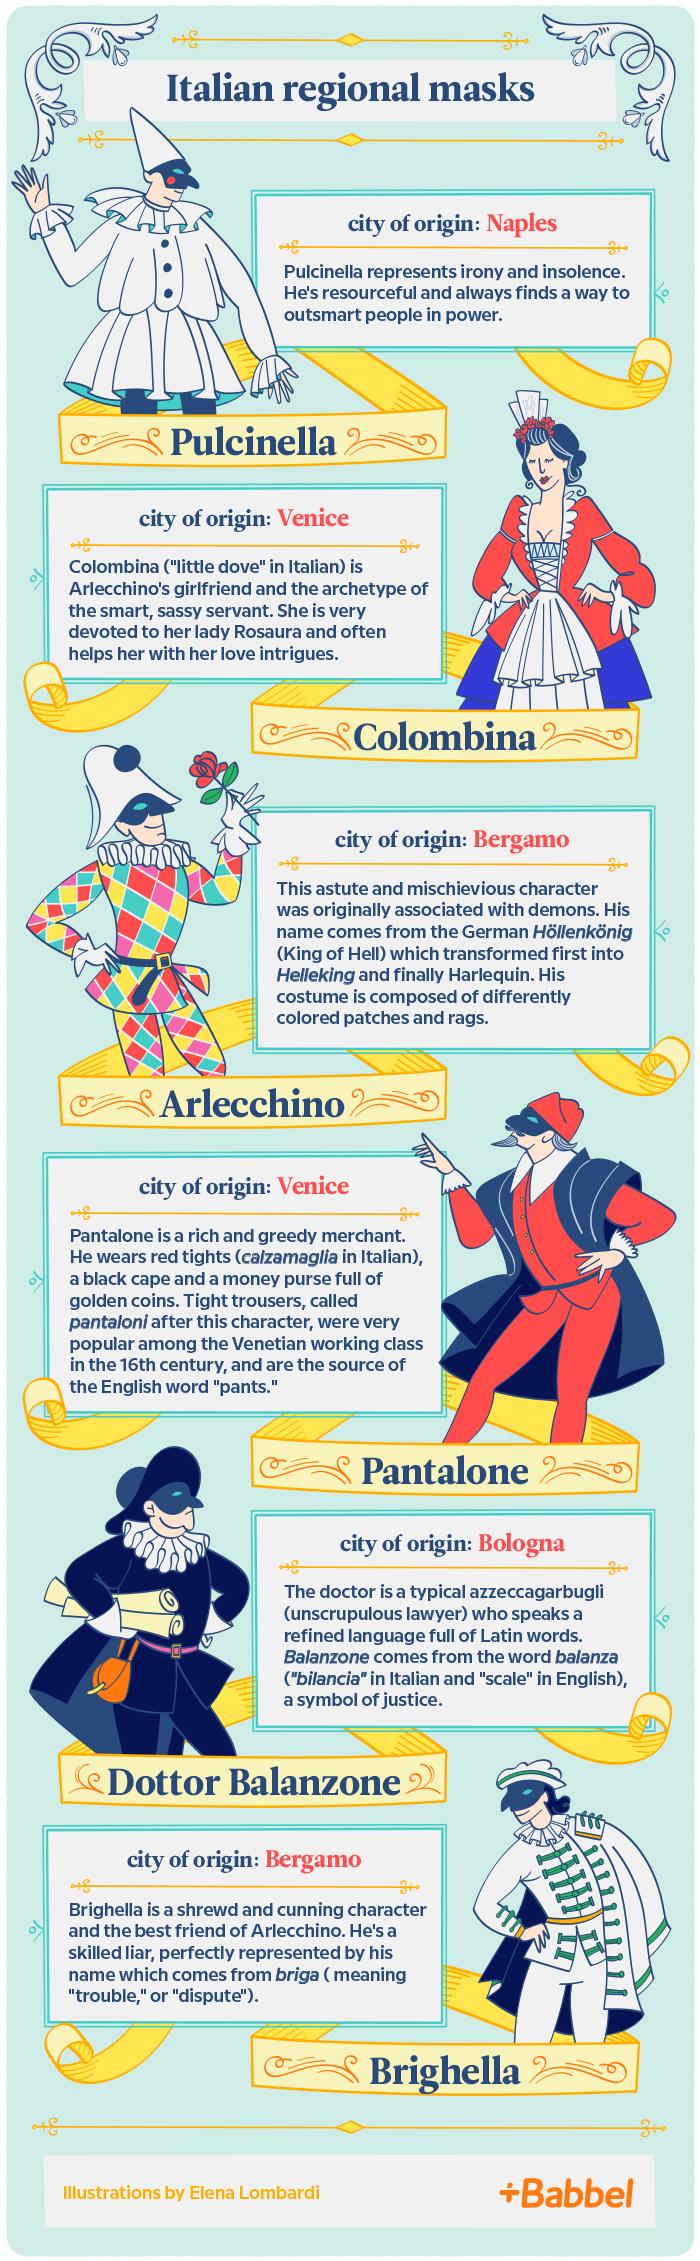 The Origins Of Italian Carnival Masks